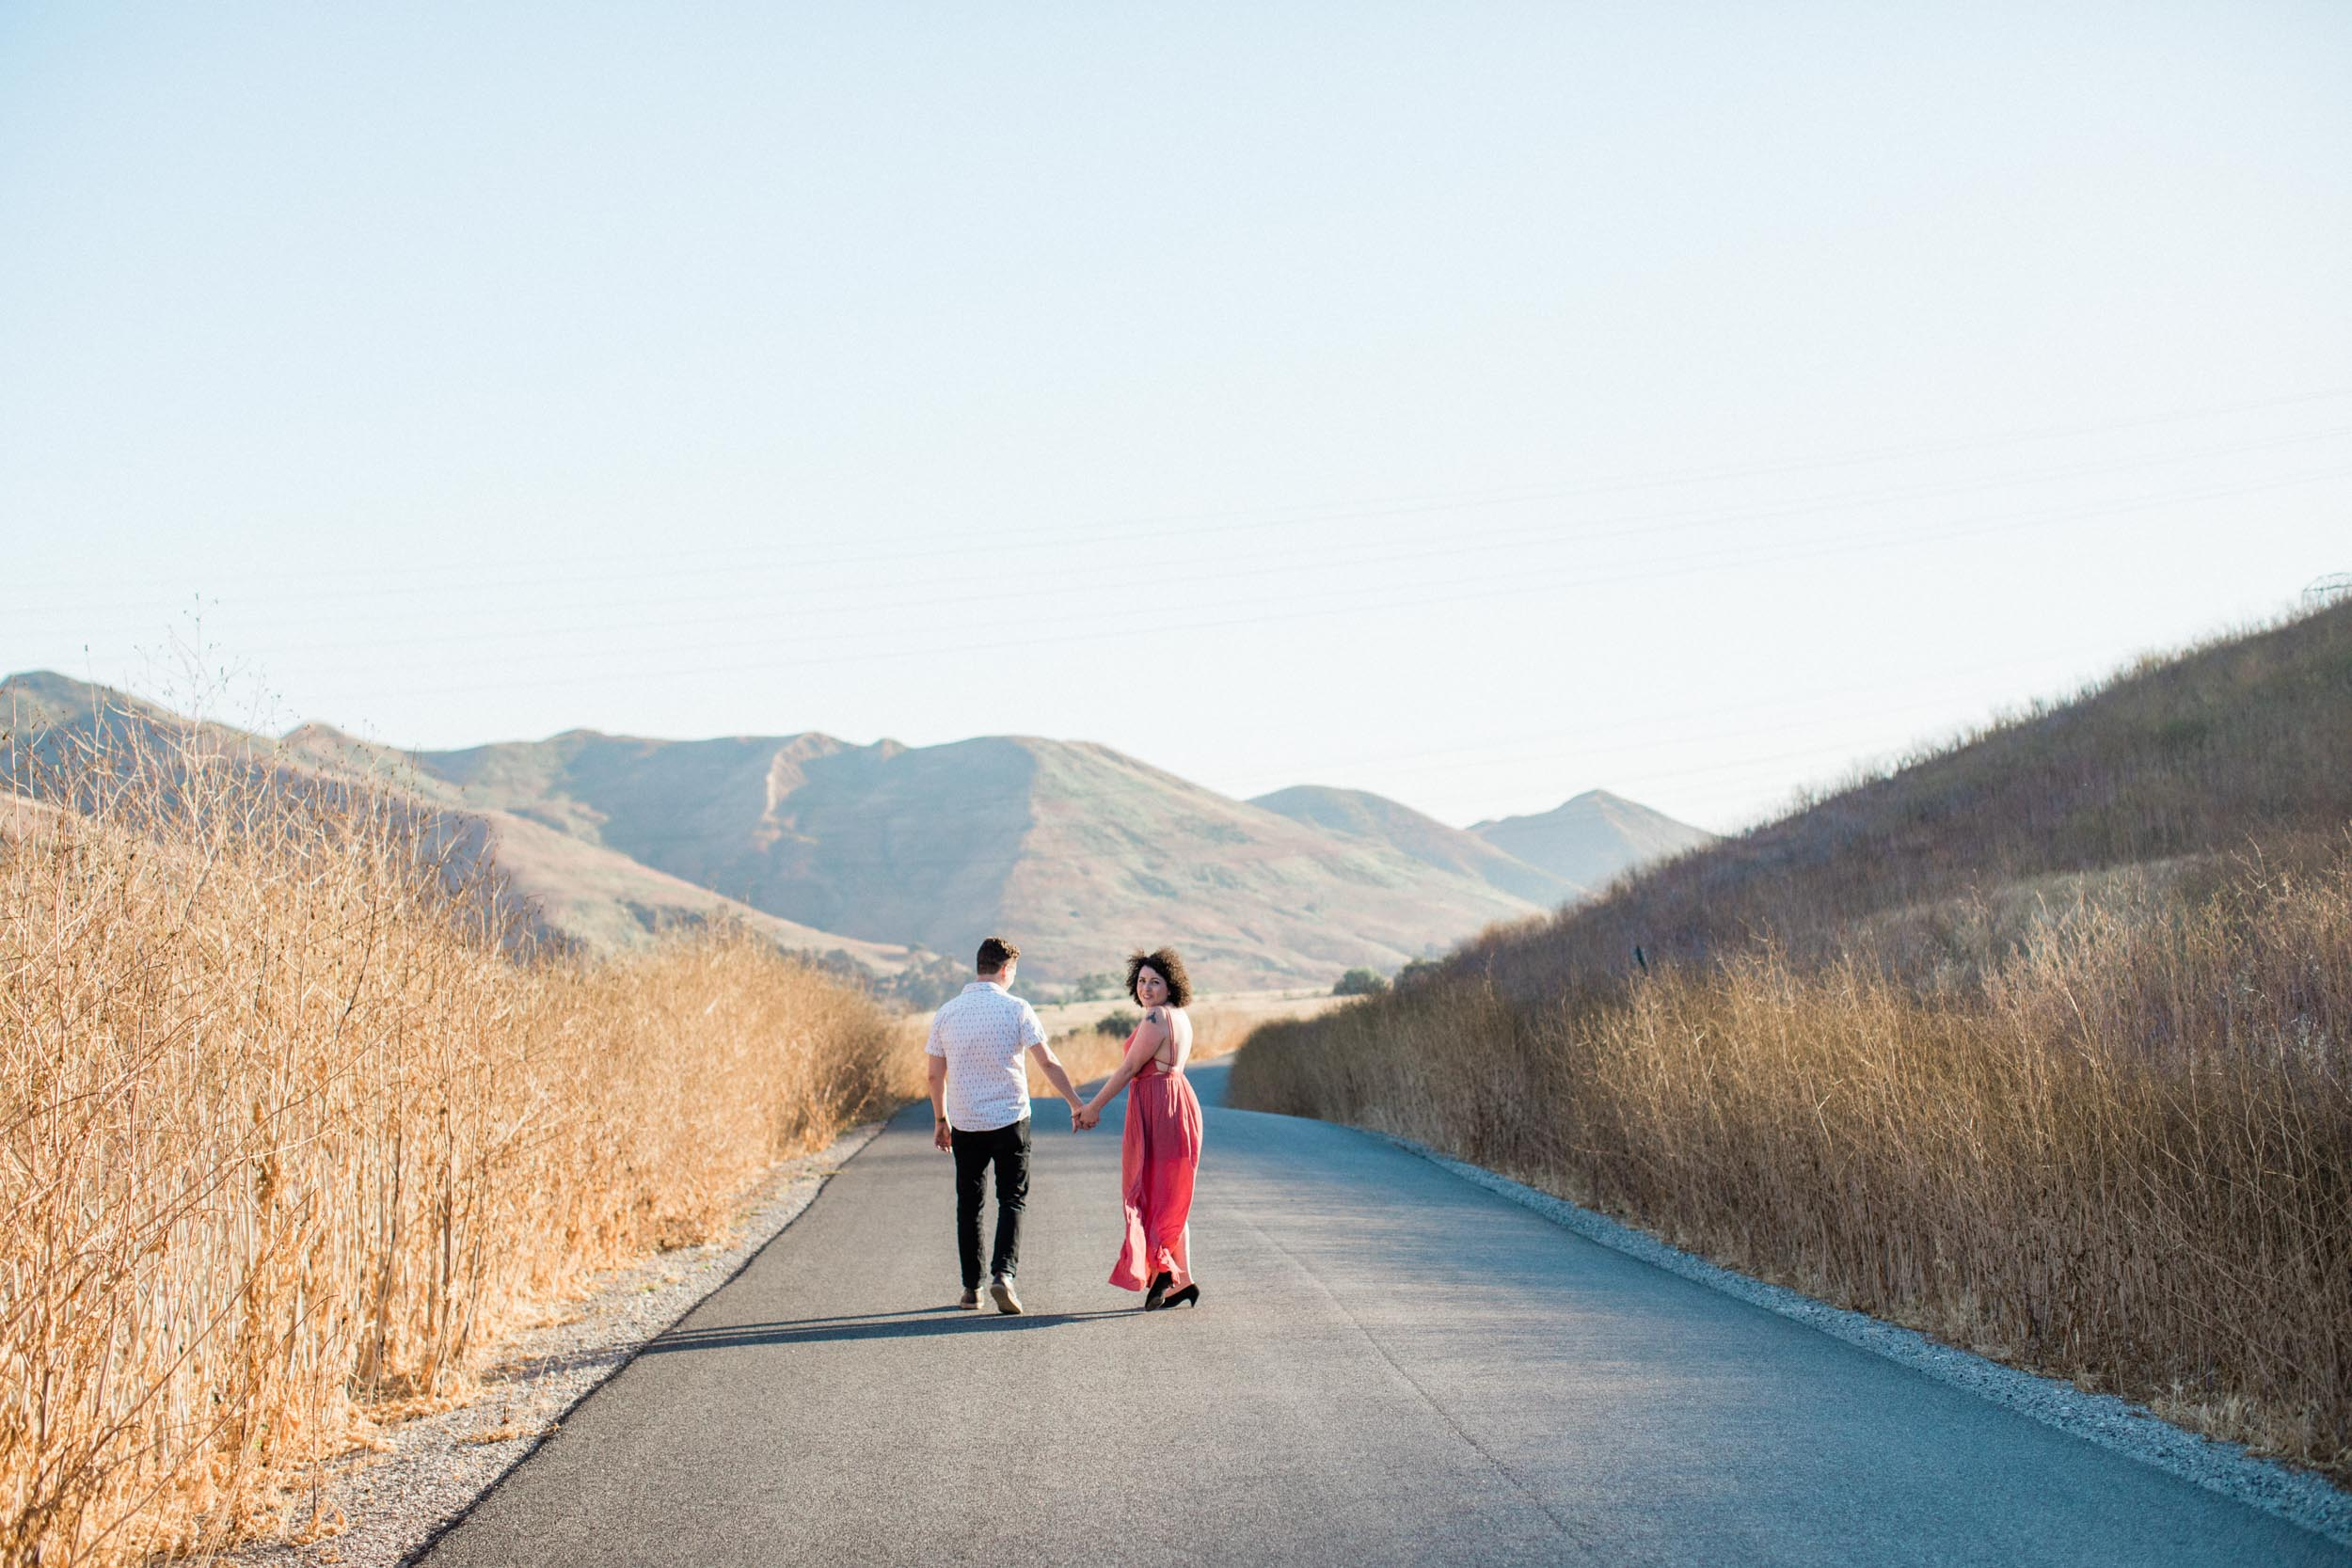 BKM-Photography-Ventura-Southern-California-Engagement-Wedding-0014.jpg